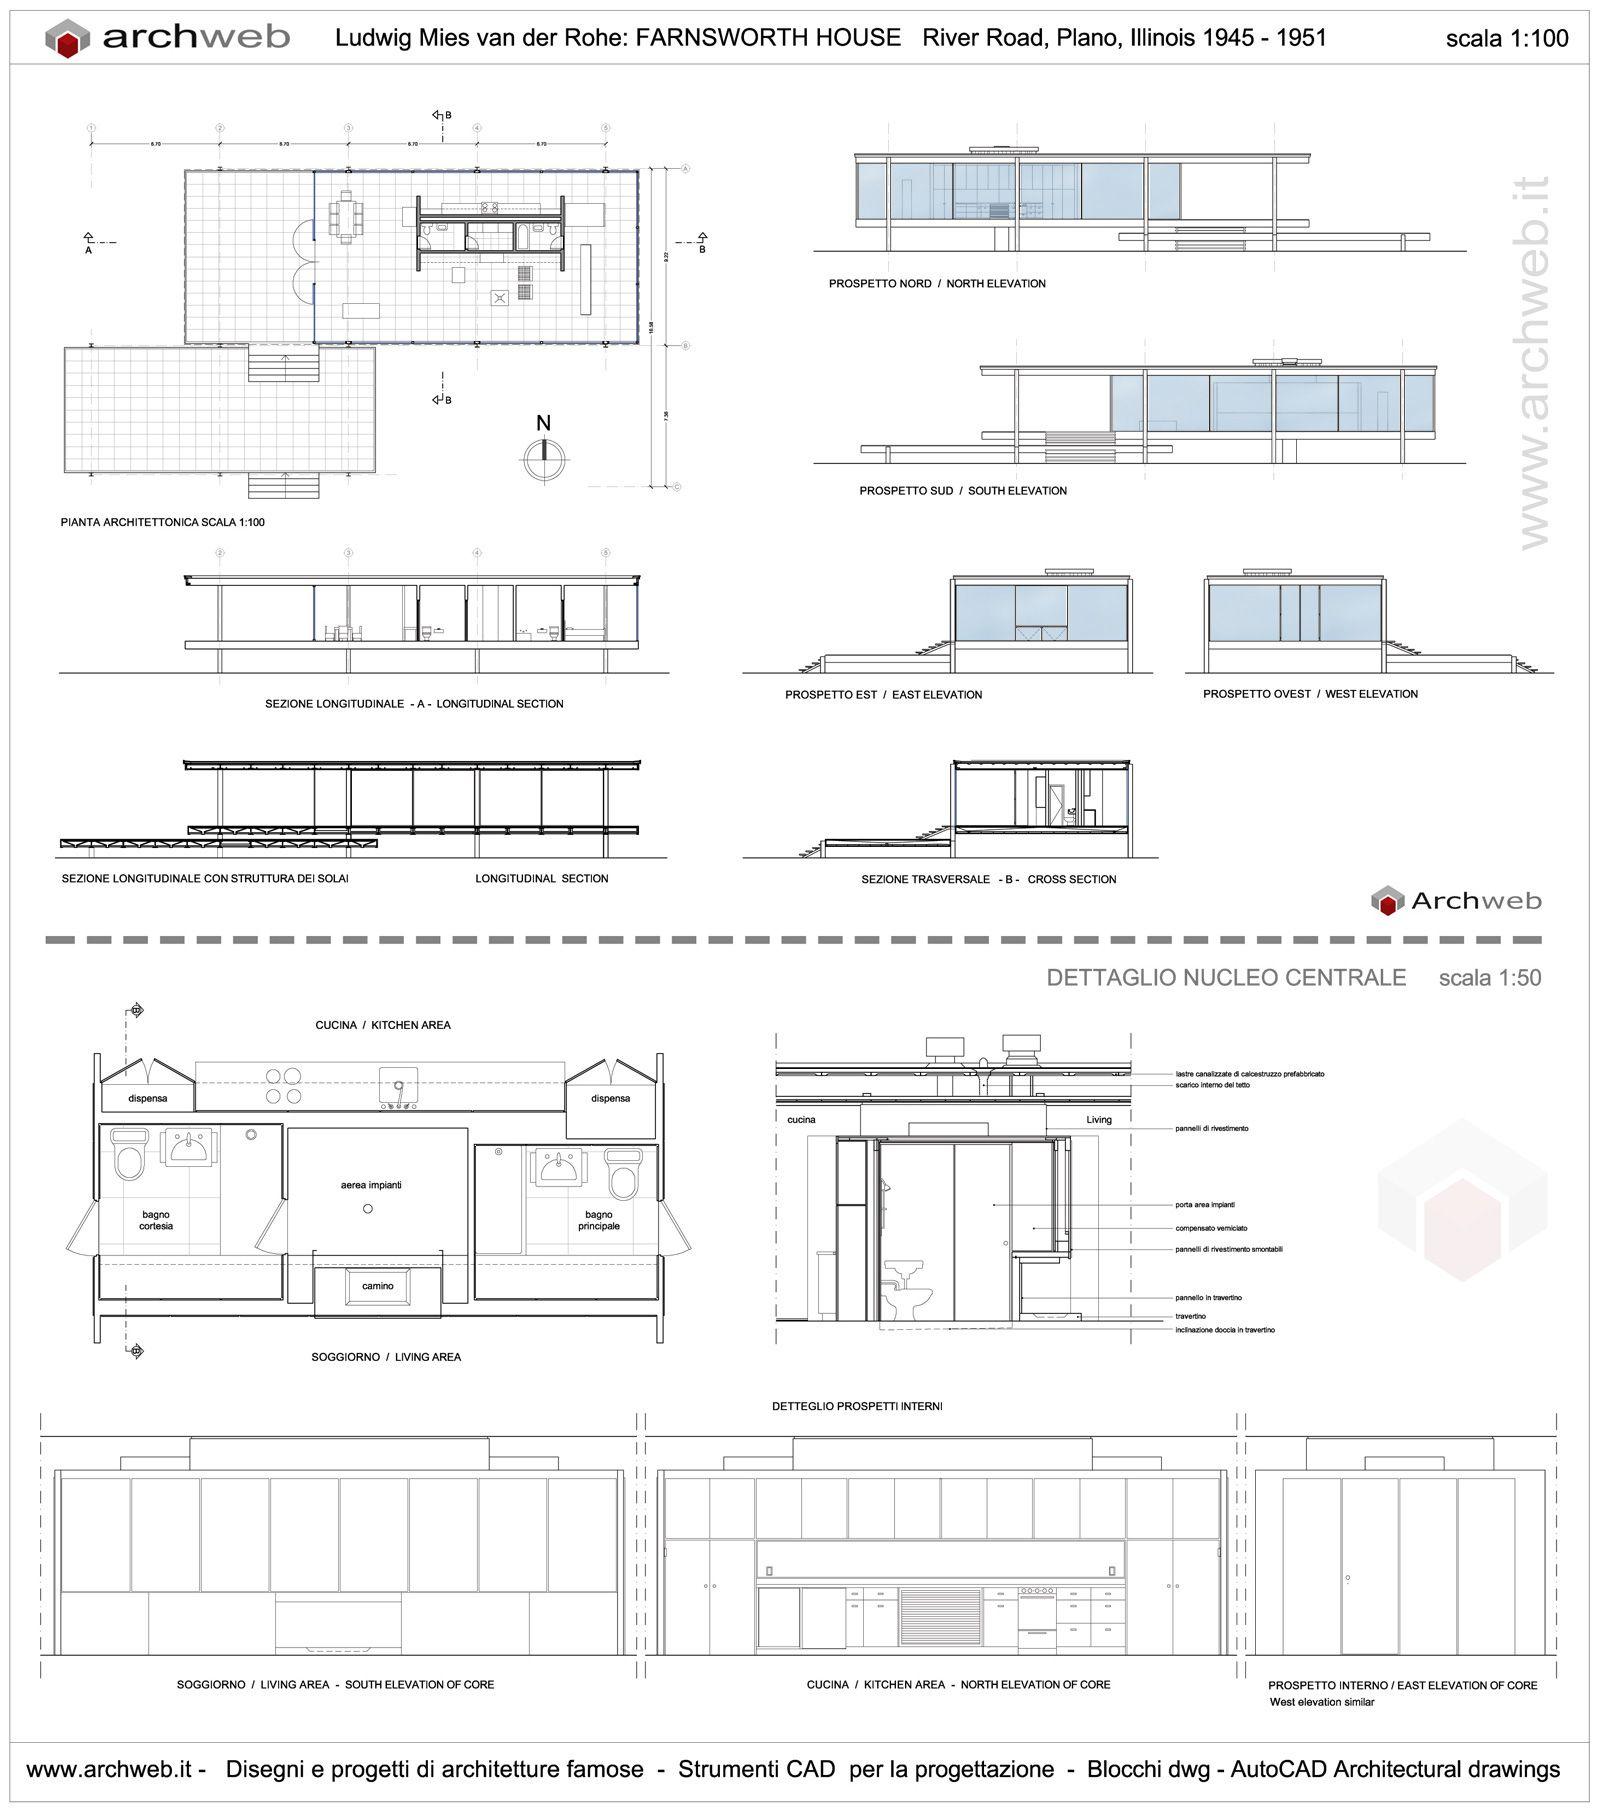 Farnsworth House drawings plan M s. Farnsworth House drawings plan     Pinteres